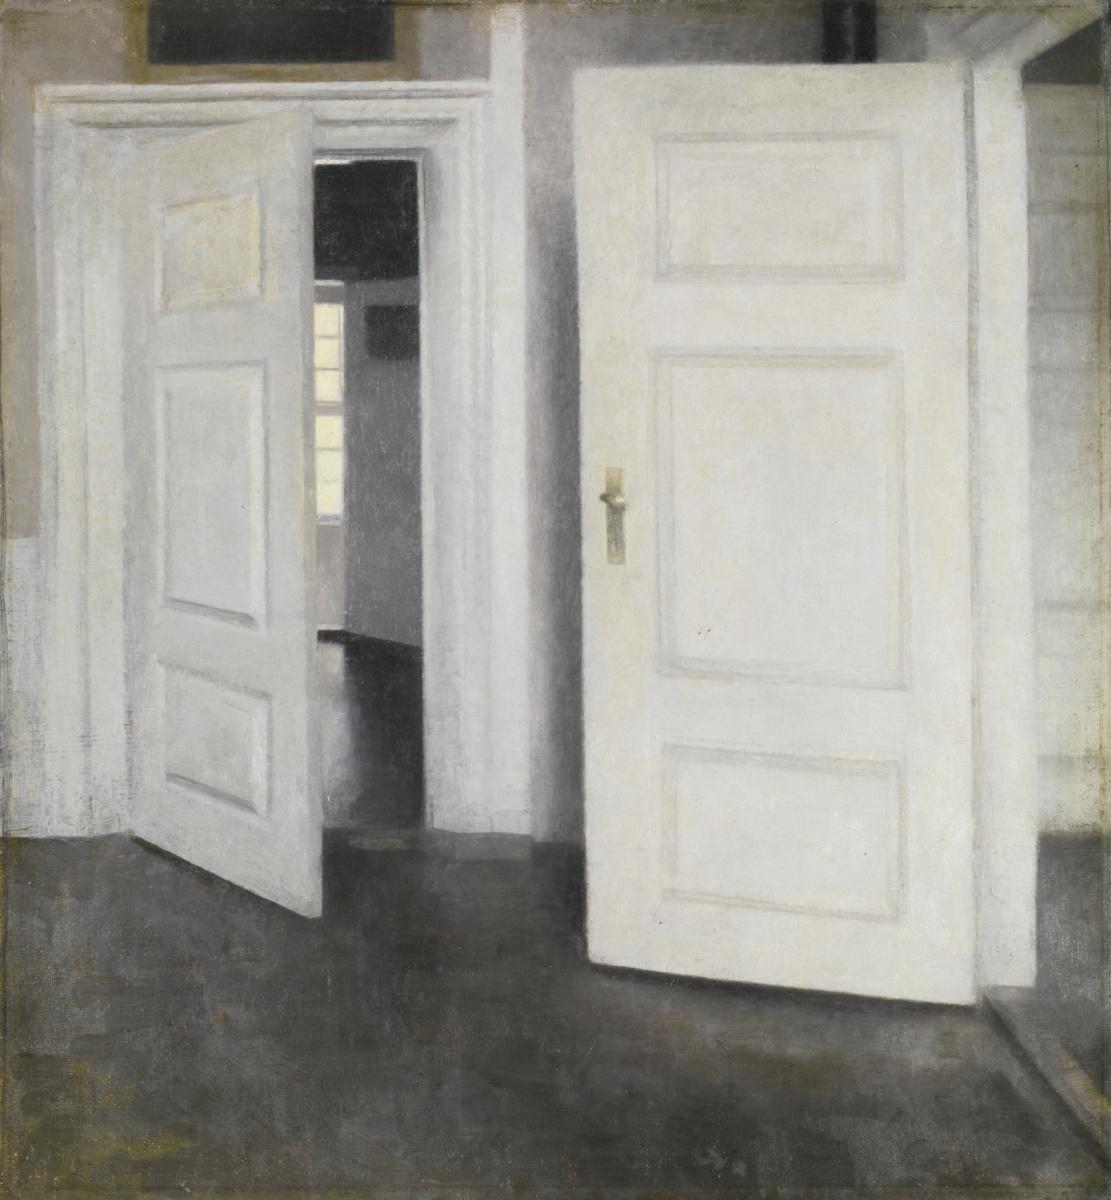 Vilhelm Hammershøi. White doors. Stranddheed, 30